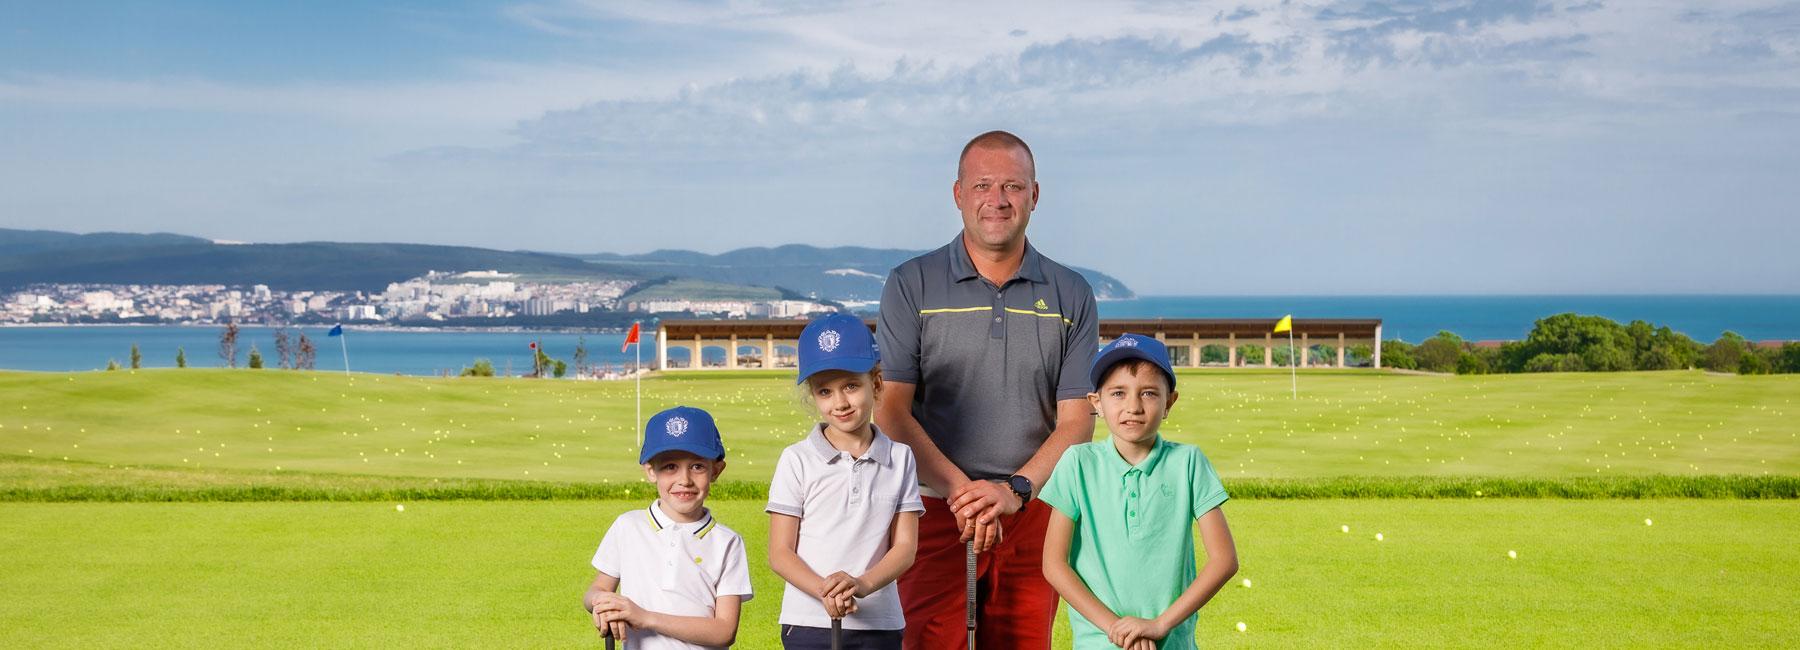 Турнир по гольфу среди детей «KIDS CHALLENGE 2019», 28 августа